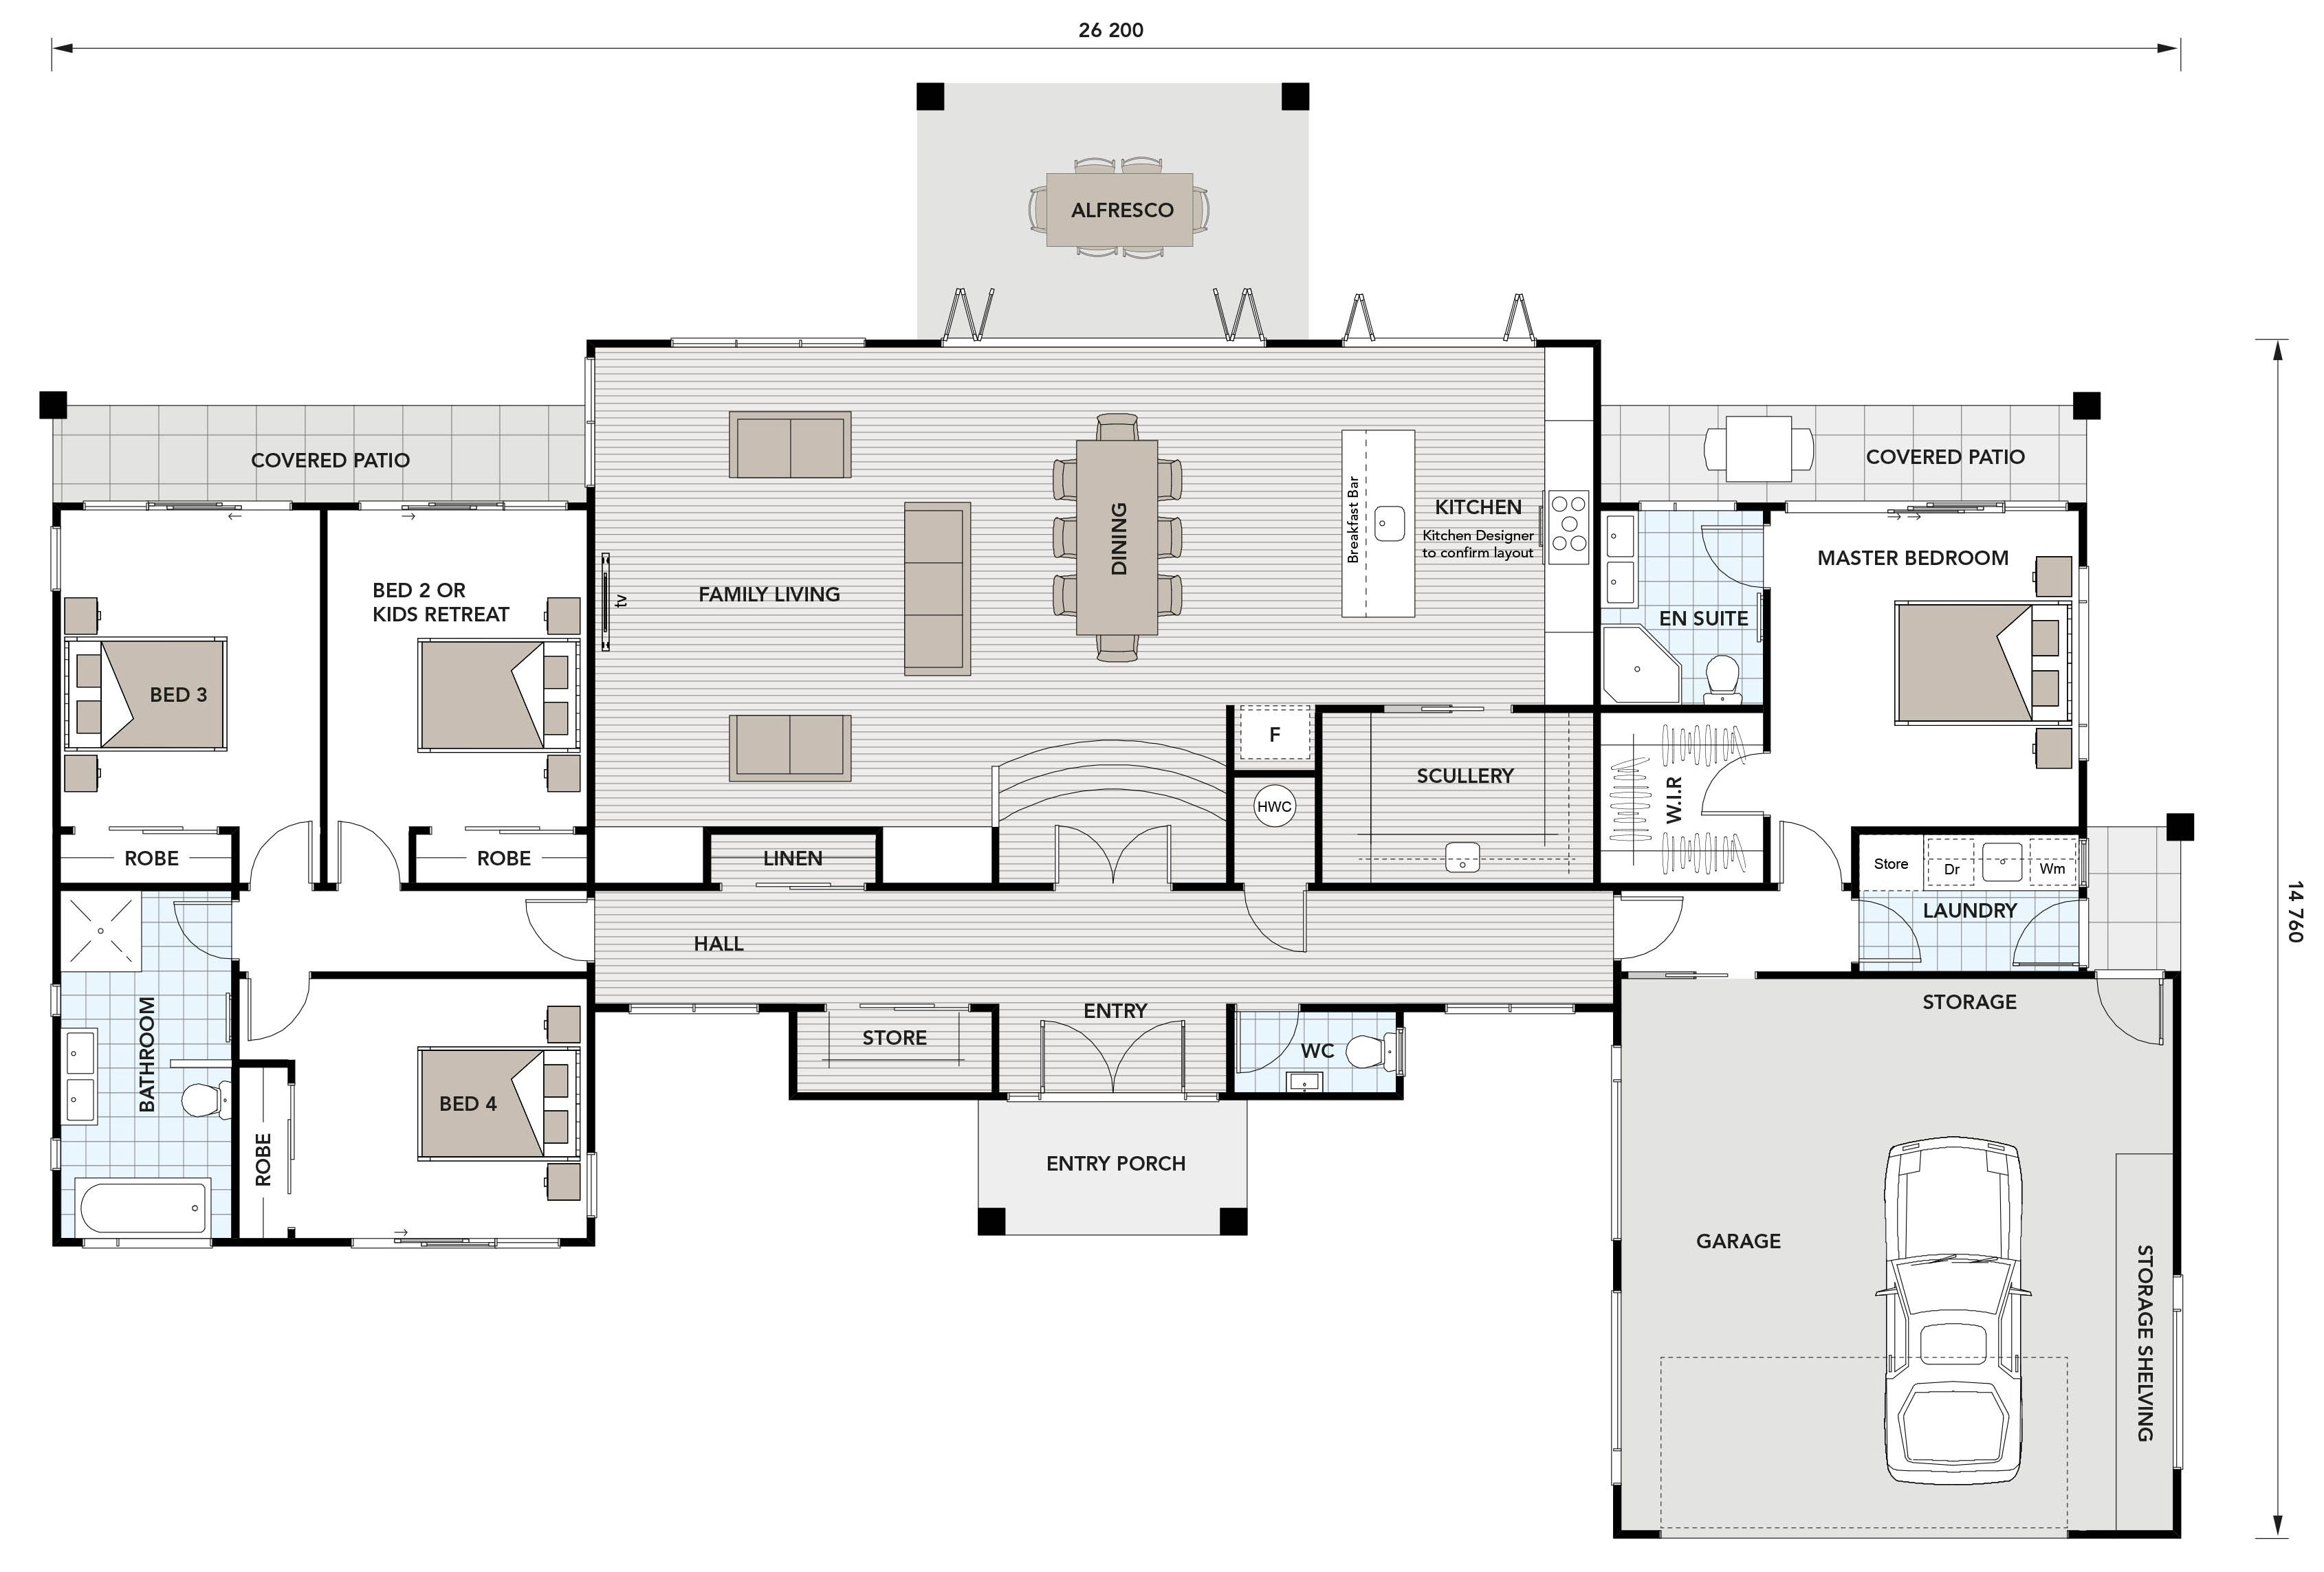 Matai 255 Ikon Homes Bedroom House Plans House Blueprints House Floor Plans